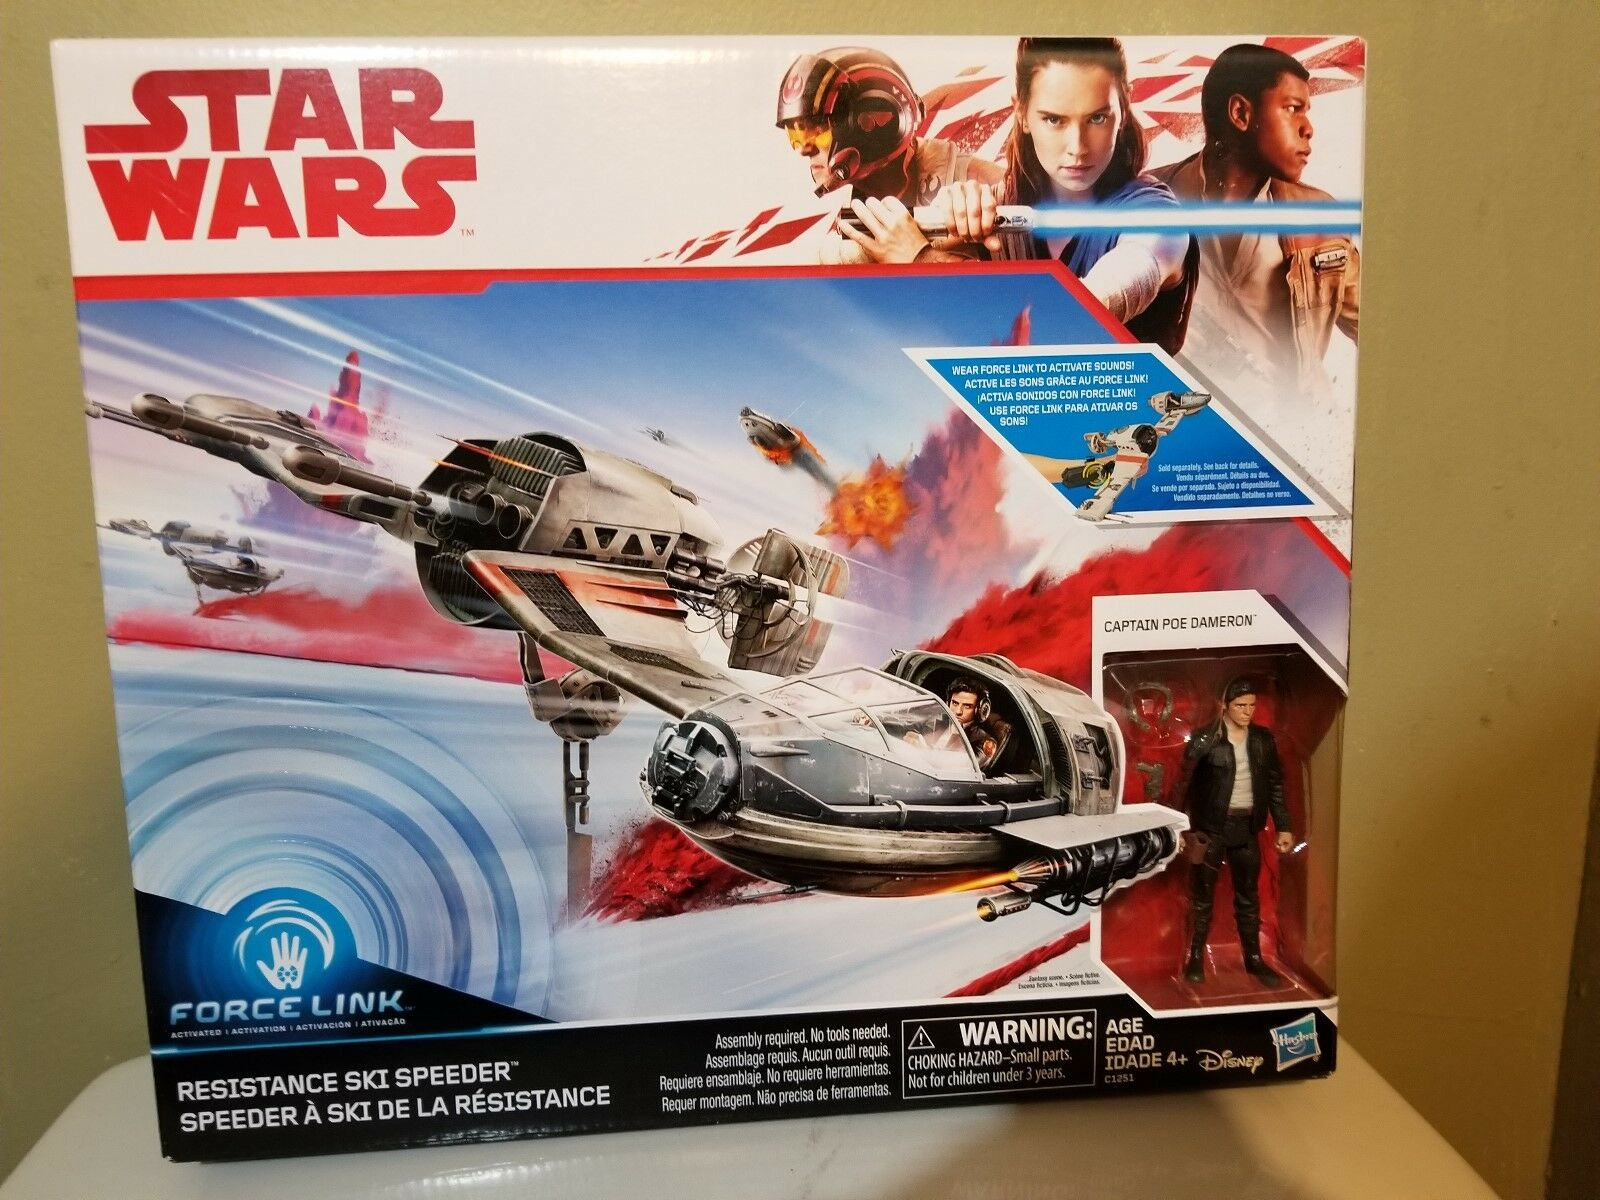 STAR WARS Resistance Ski Speeder Last Jedi Poe Dameron Hasbro